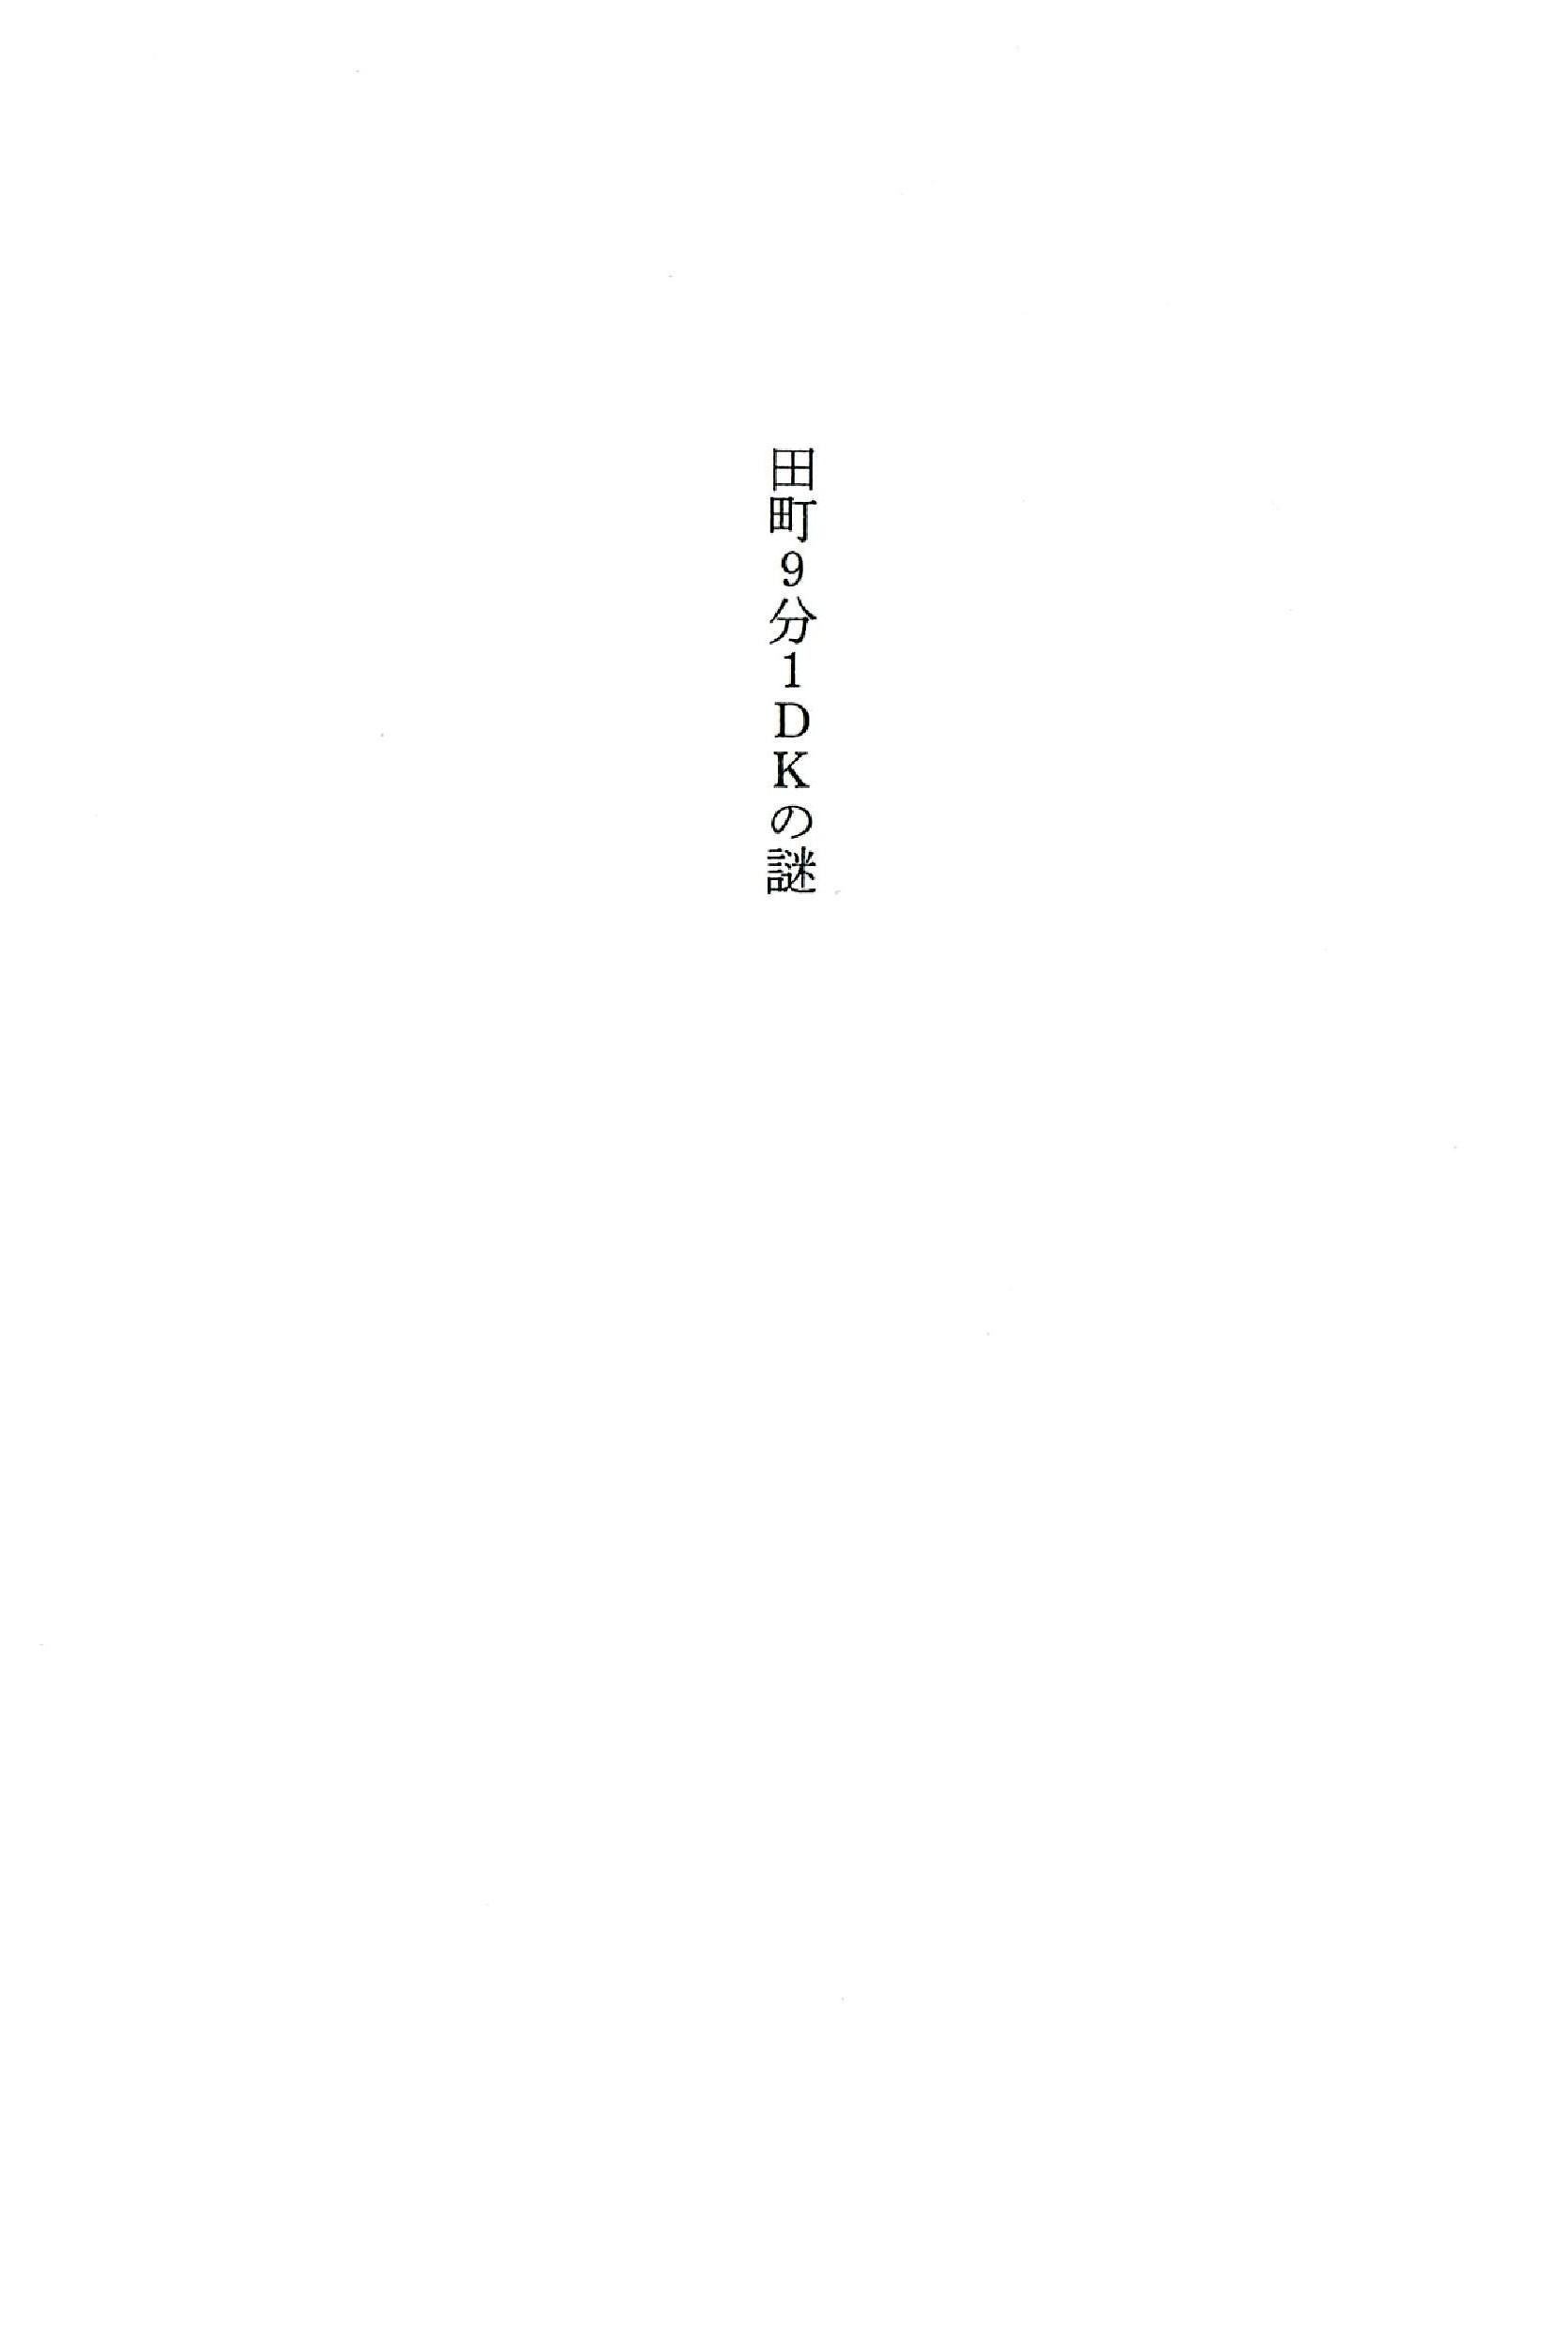 a0304335_8583888.jpg